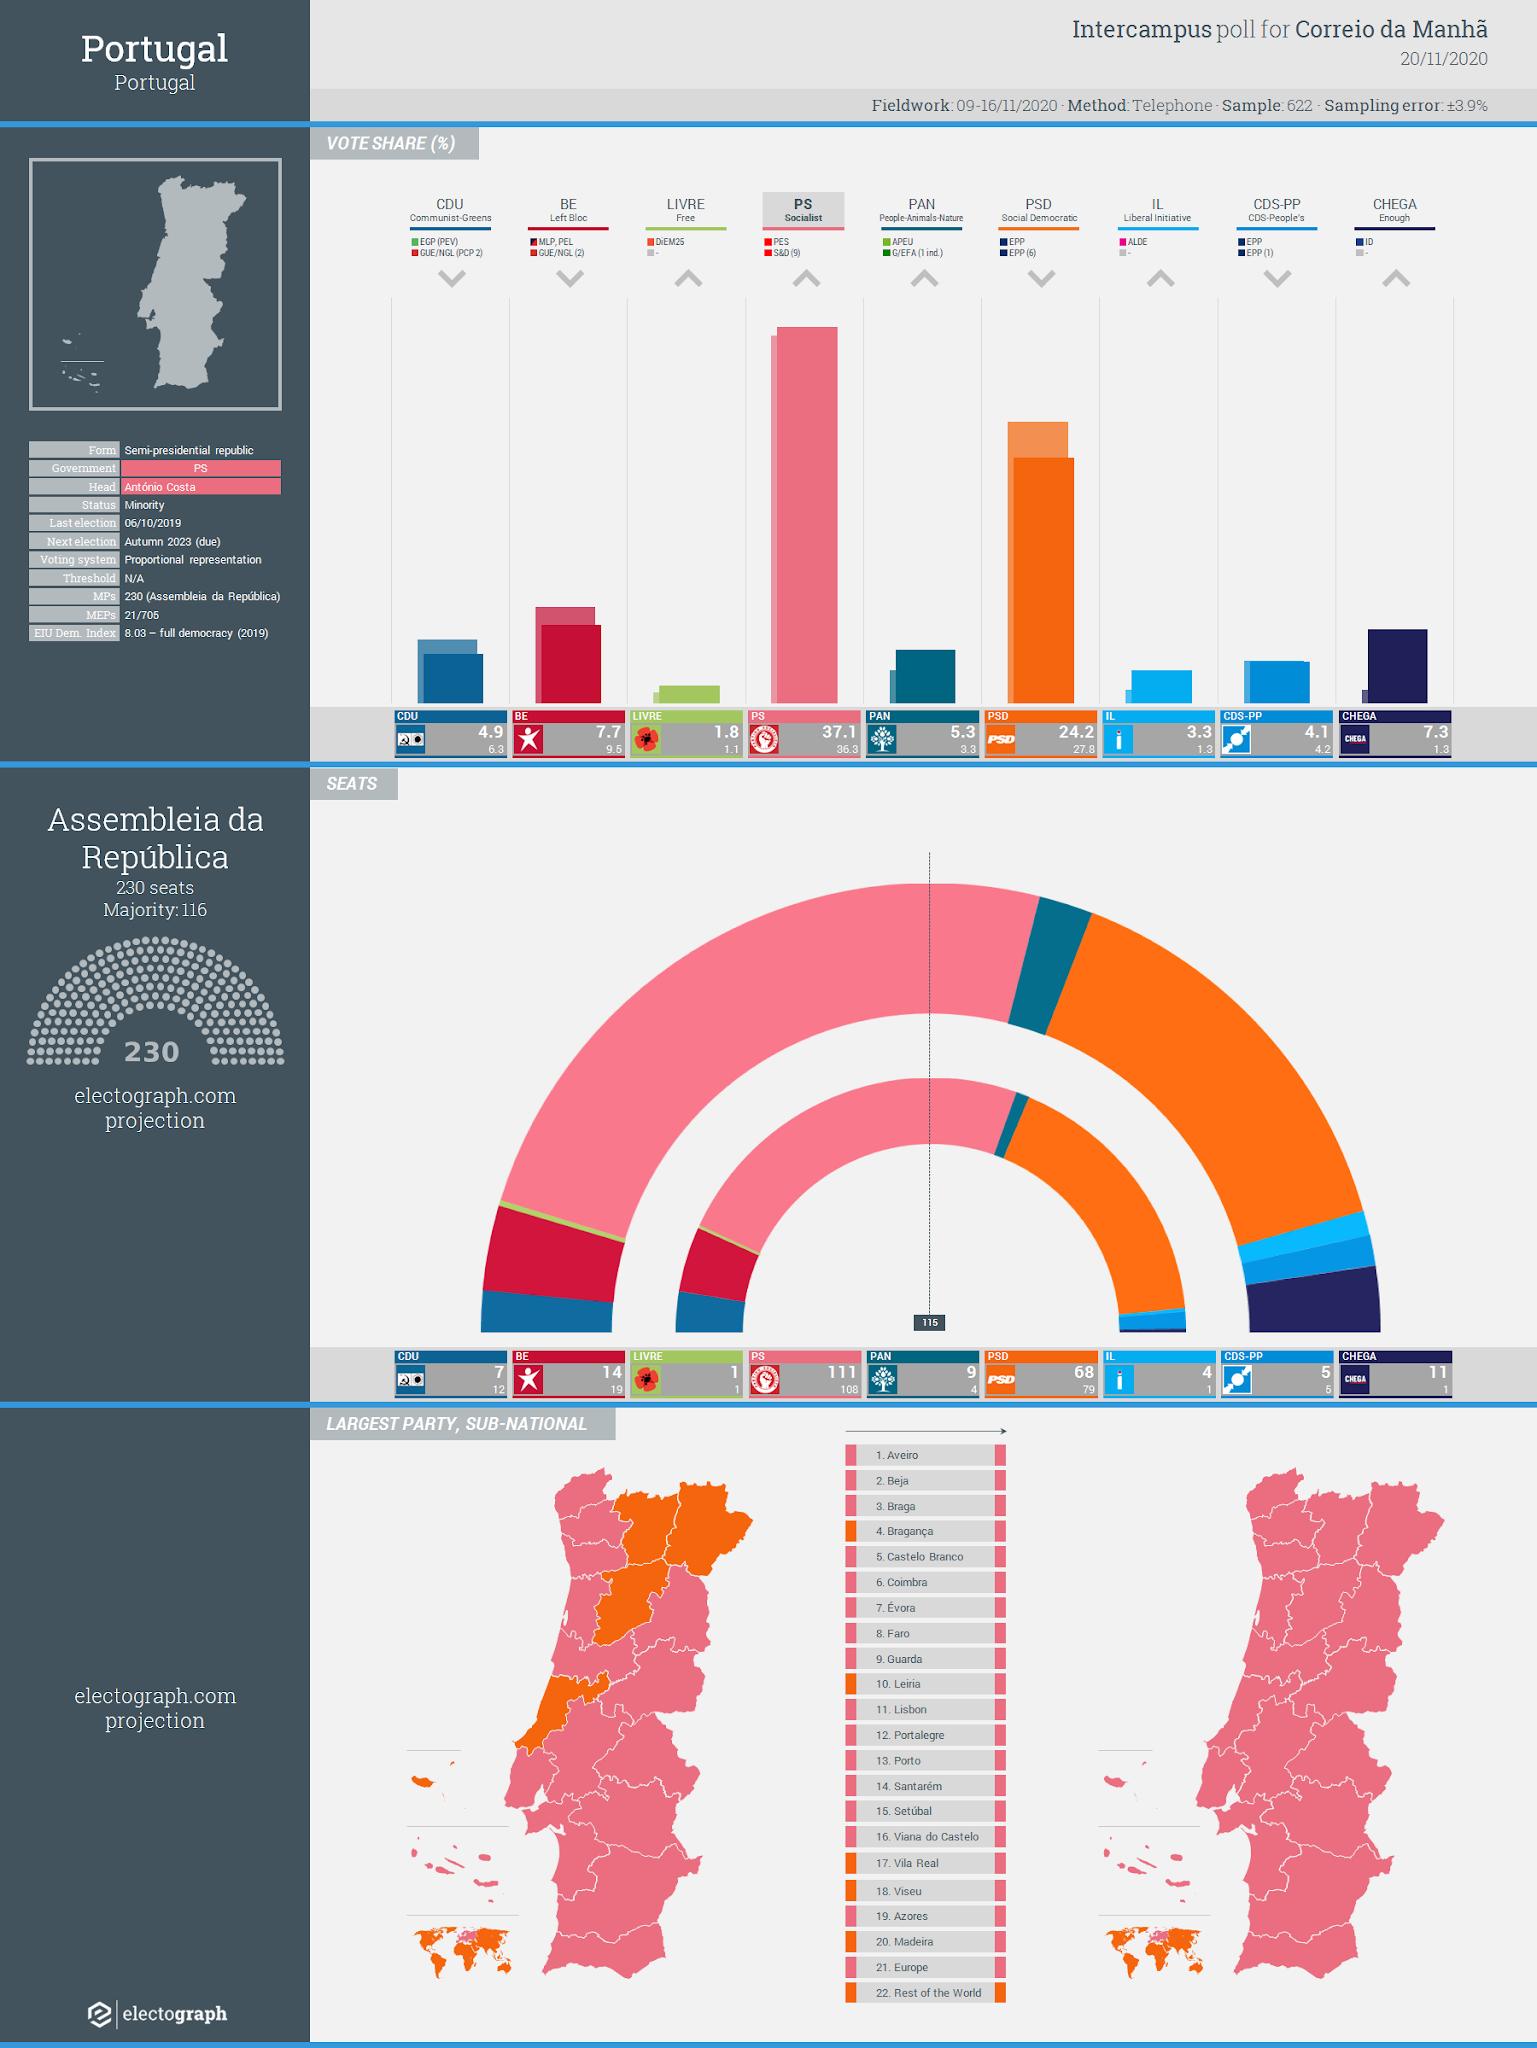 PORTUGAL: Intercampus poll chart for Correio da Manhã, 20 November 2020